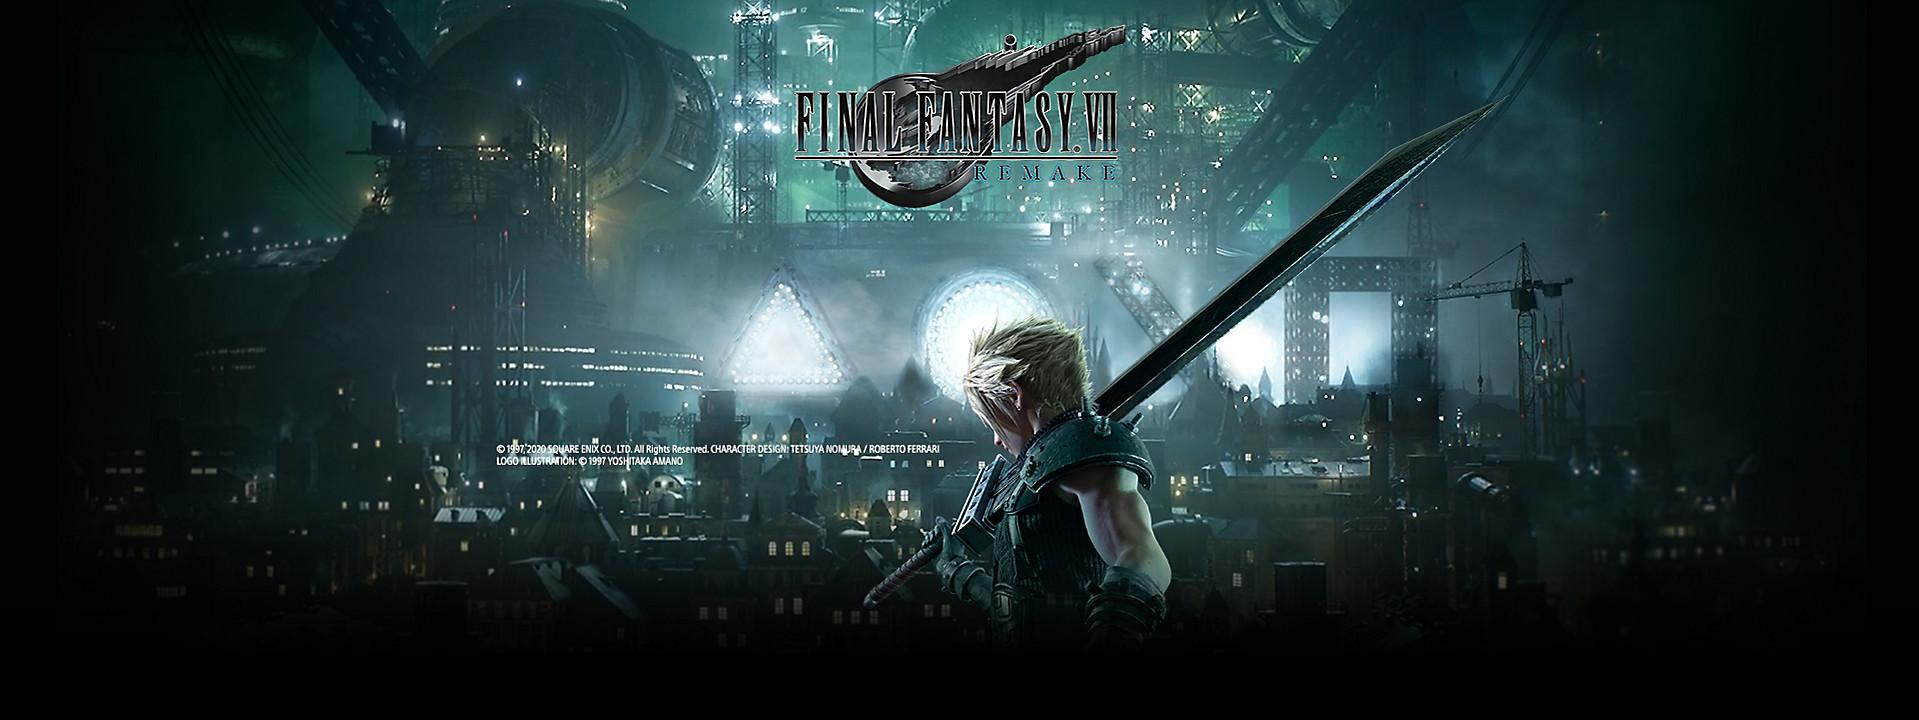 https://media.playstation.com/is/image/SCEA/final-fantasy-vii-remake-homepage-marquee-desktop-02-ps4-30mar20?$native_xxl_nt$